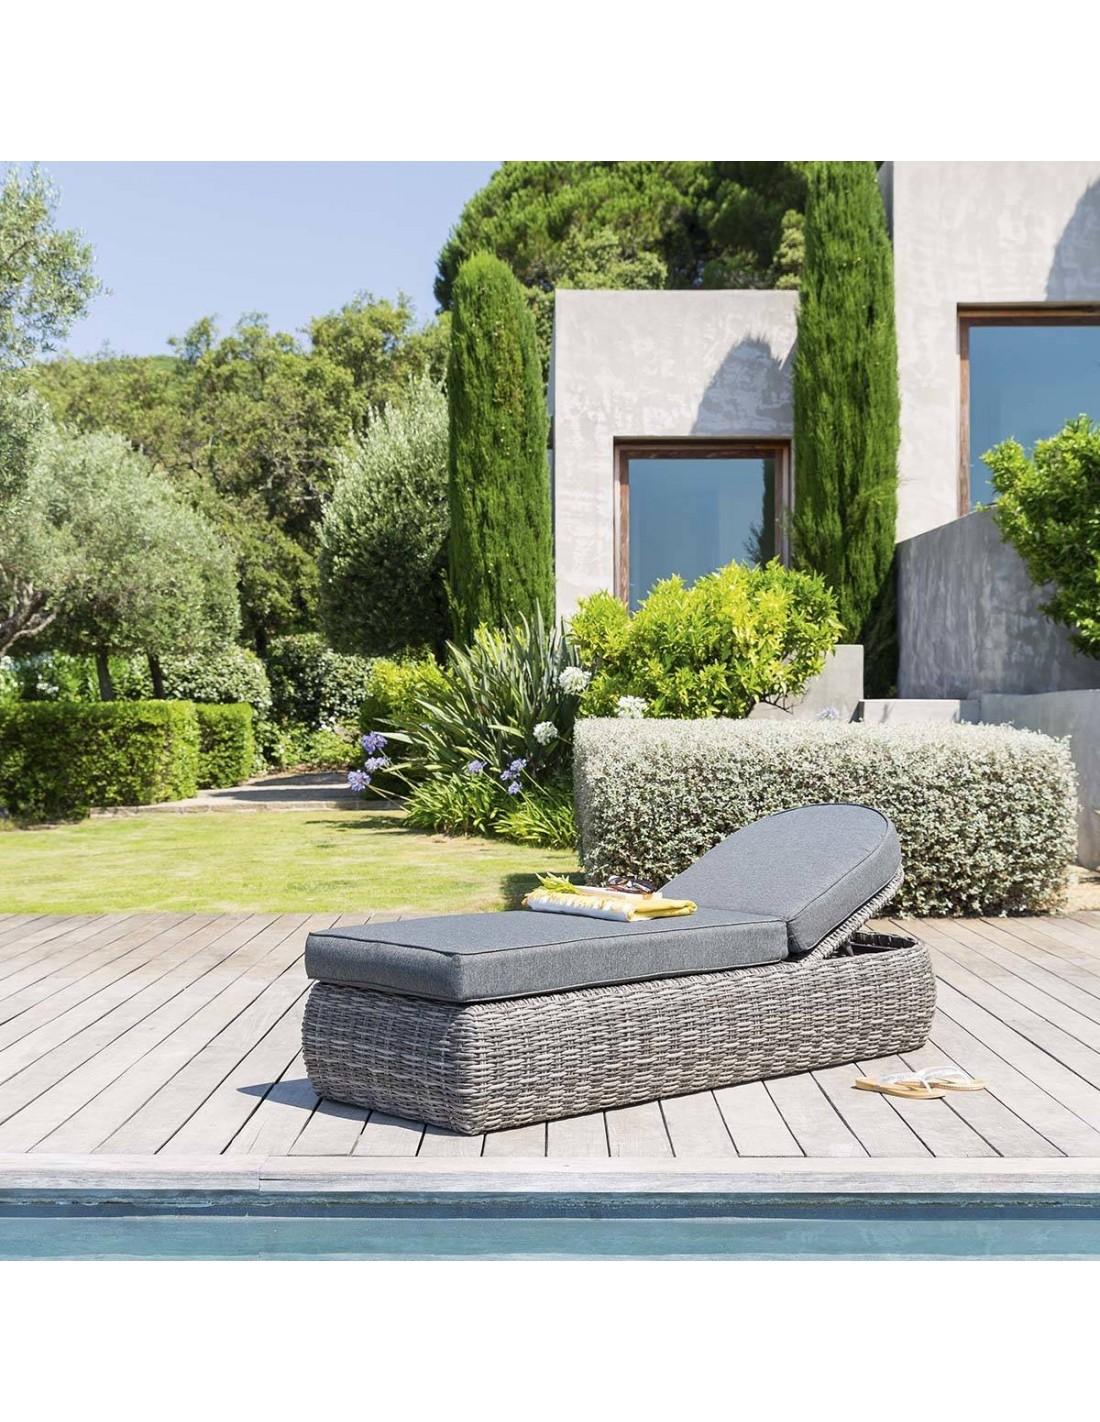 lit de piscine moor a aluminium et r sine tress e. Black Bedroom Furniture Sets. Home Design Ideas